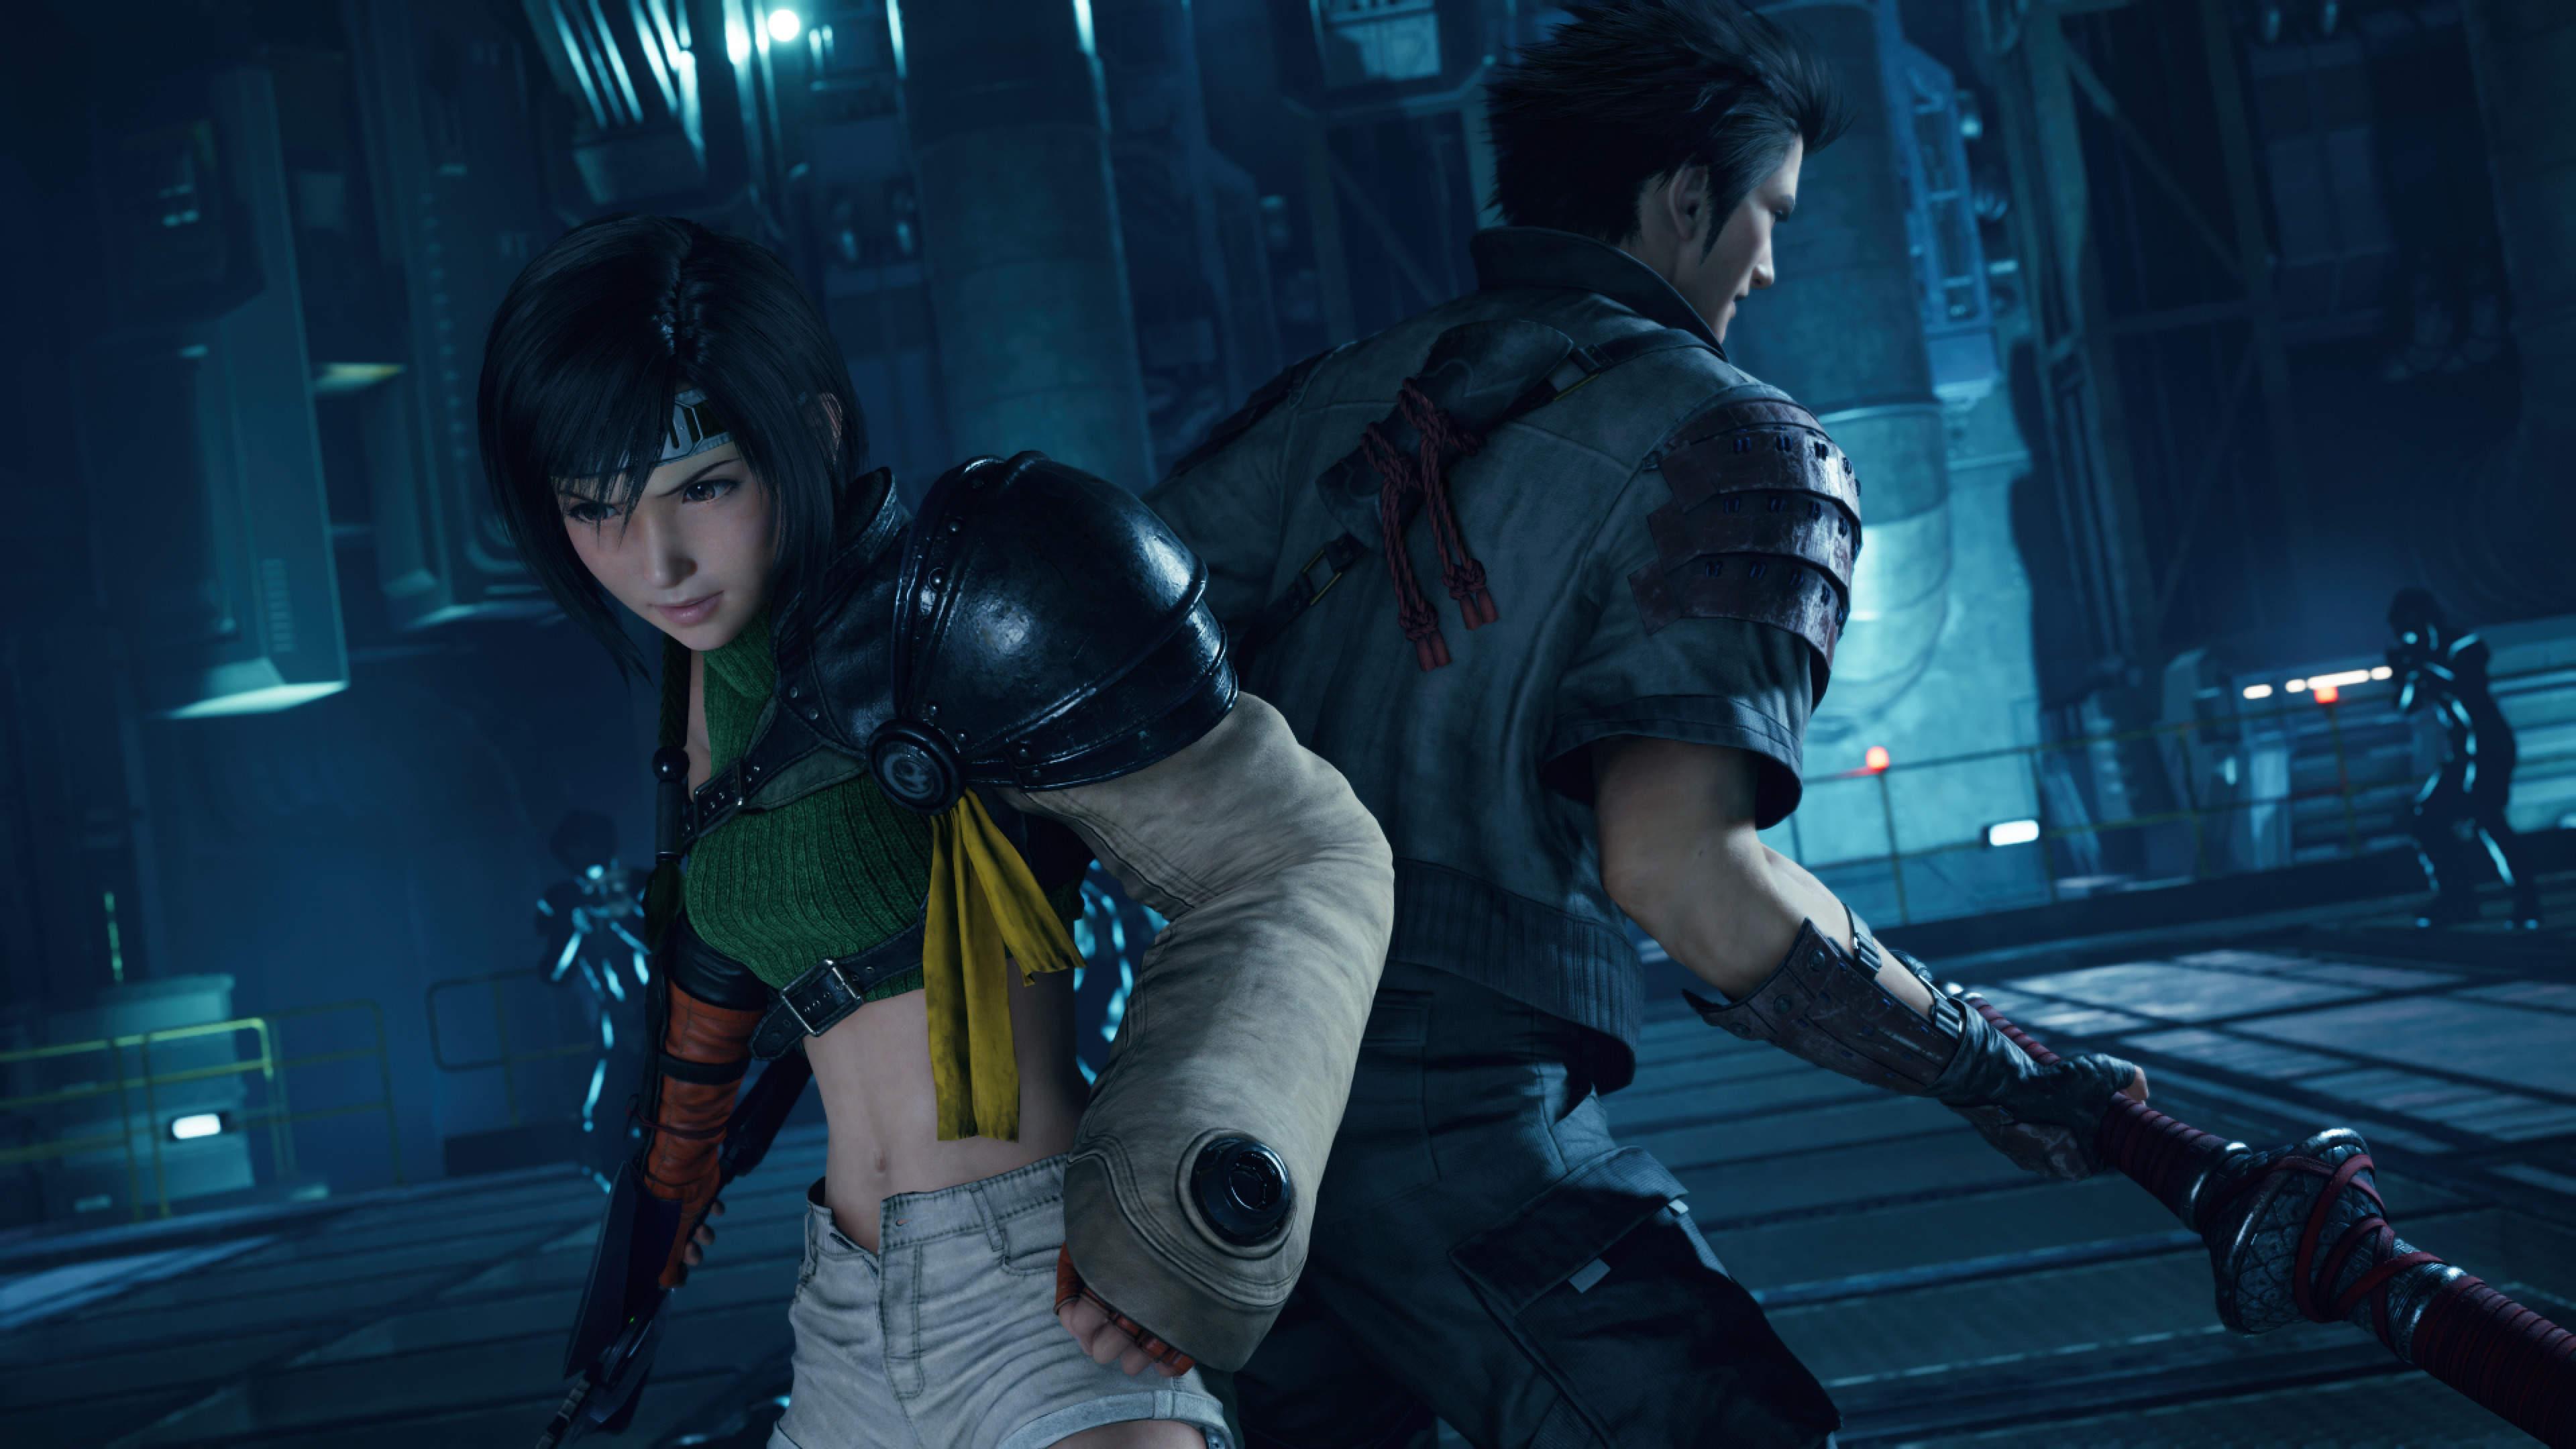 Final Fantasy VII Remake Intergrade state of play